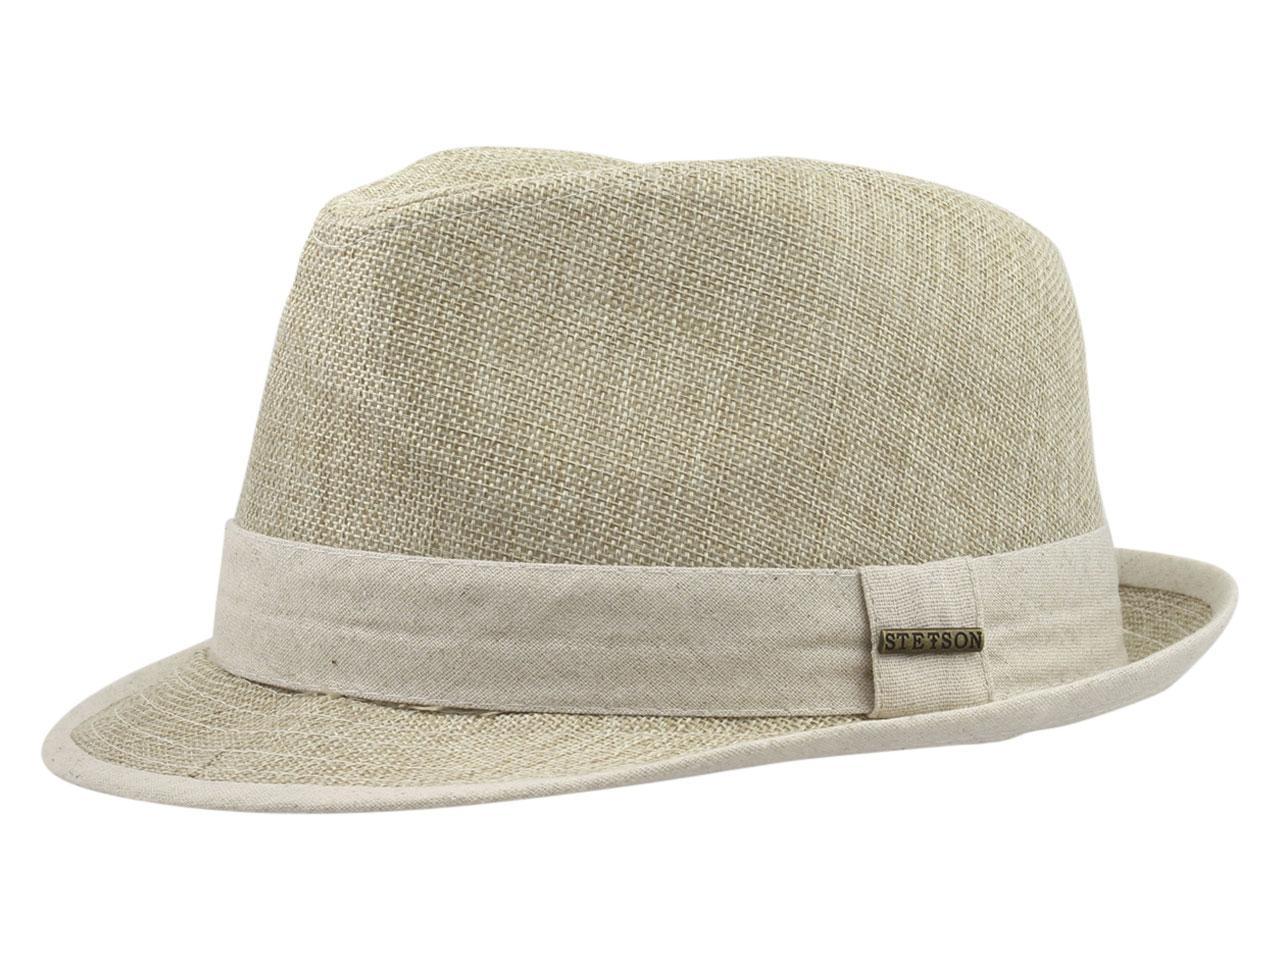 Image of Stetson Men's Contrast Trim Fedora Hat - Tan - Large